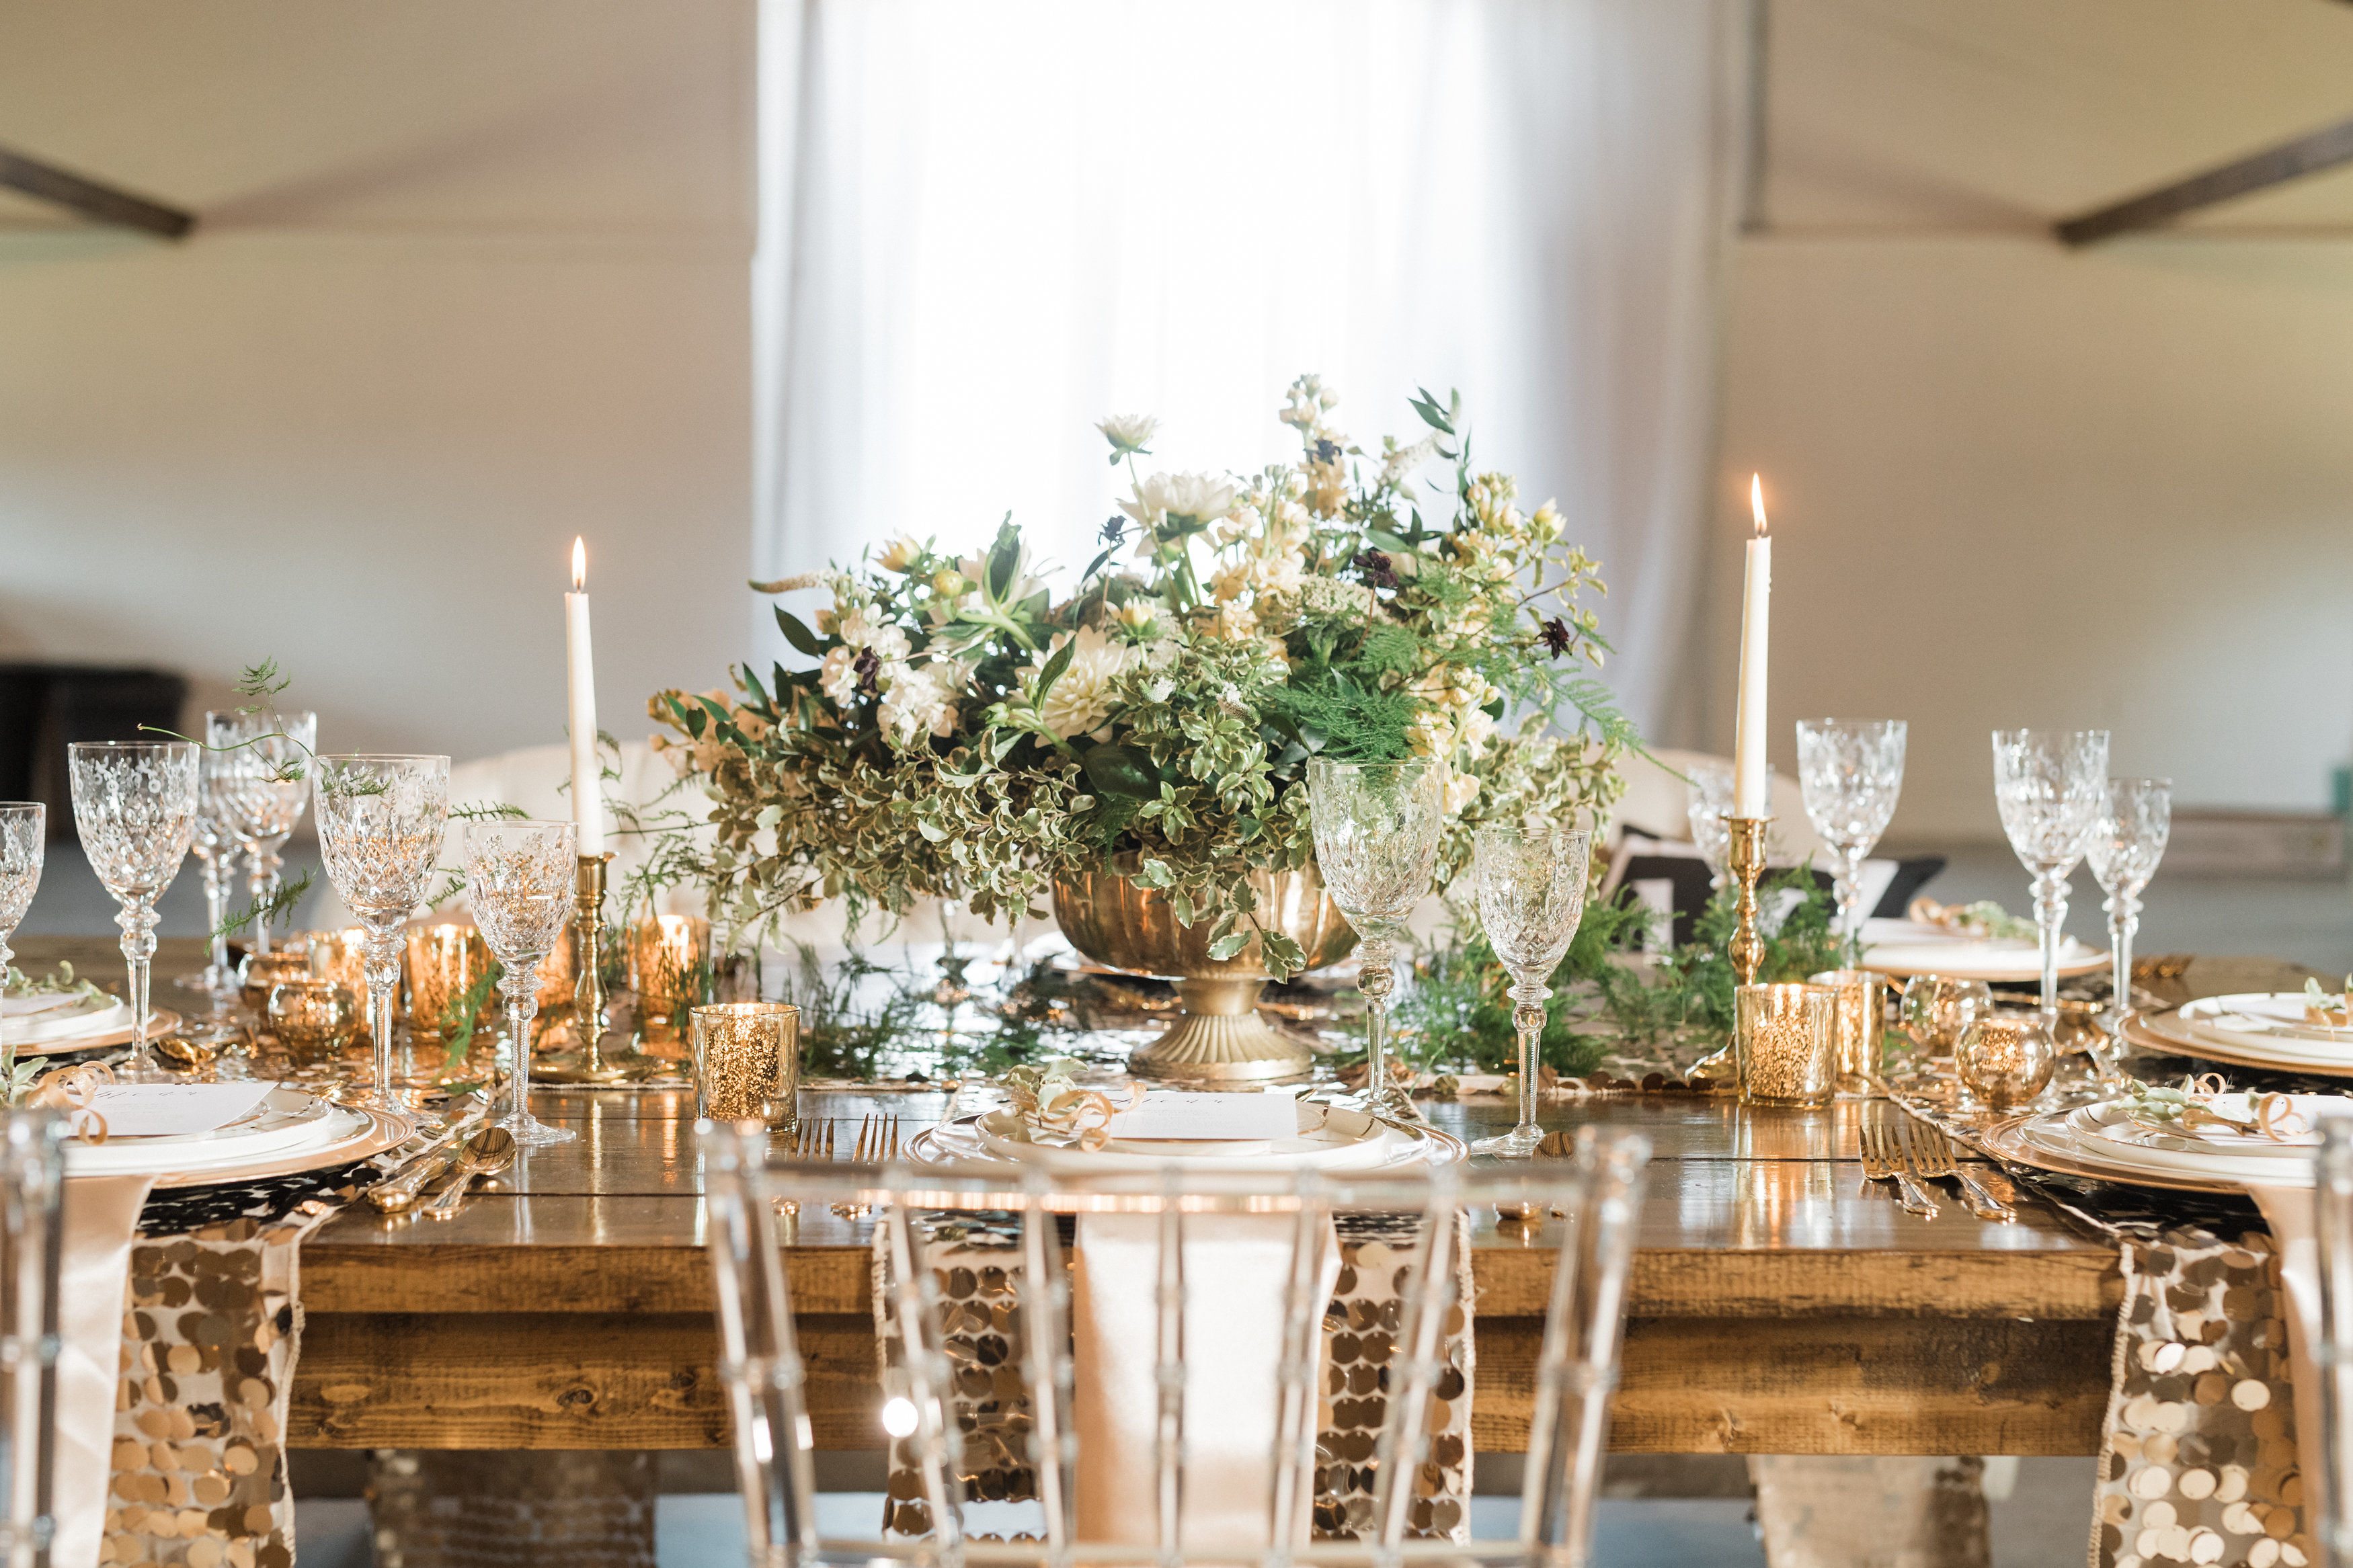 Elegant & Glam Country Wedding Inspiration